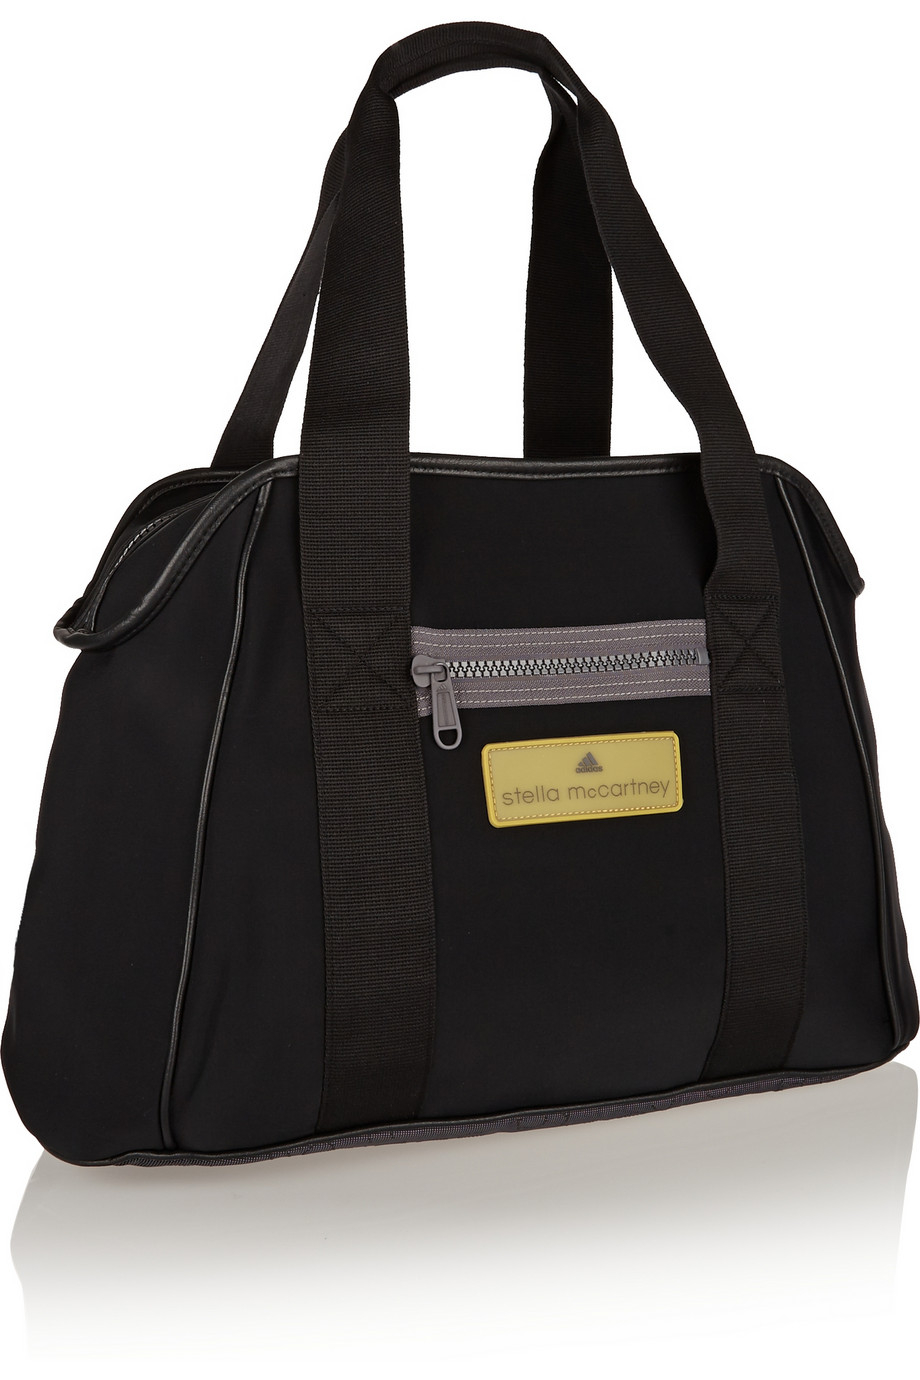 adidas by stella mccartney neoprene gym bag in black lyst. Black Bedroom Furniture Sets. Home Design Ideas